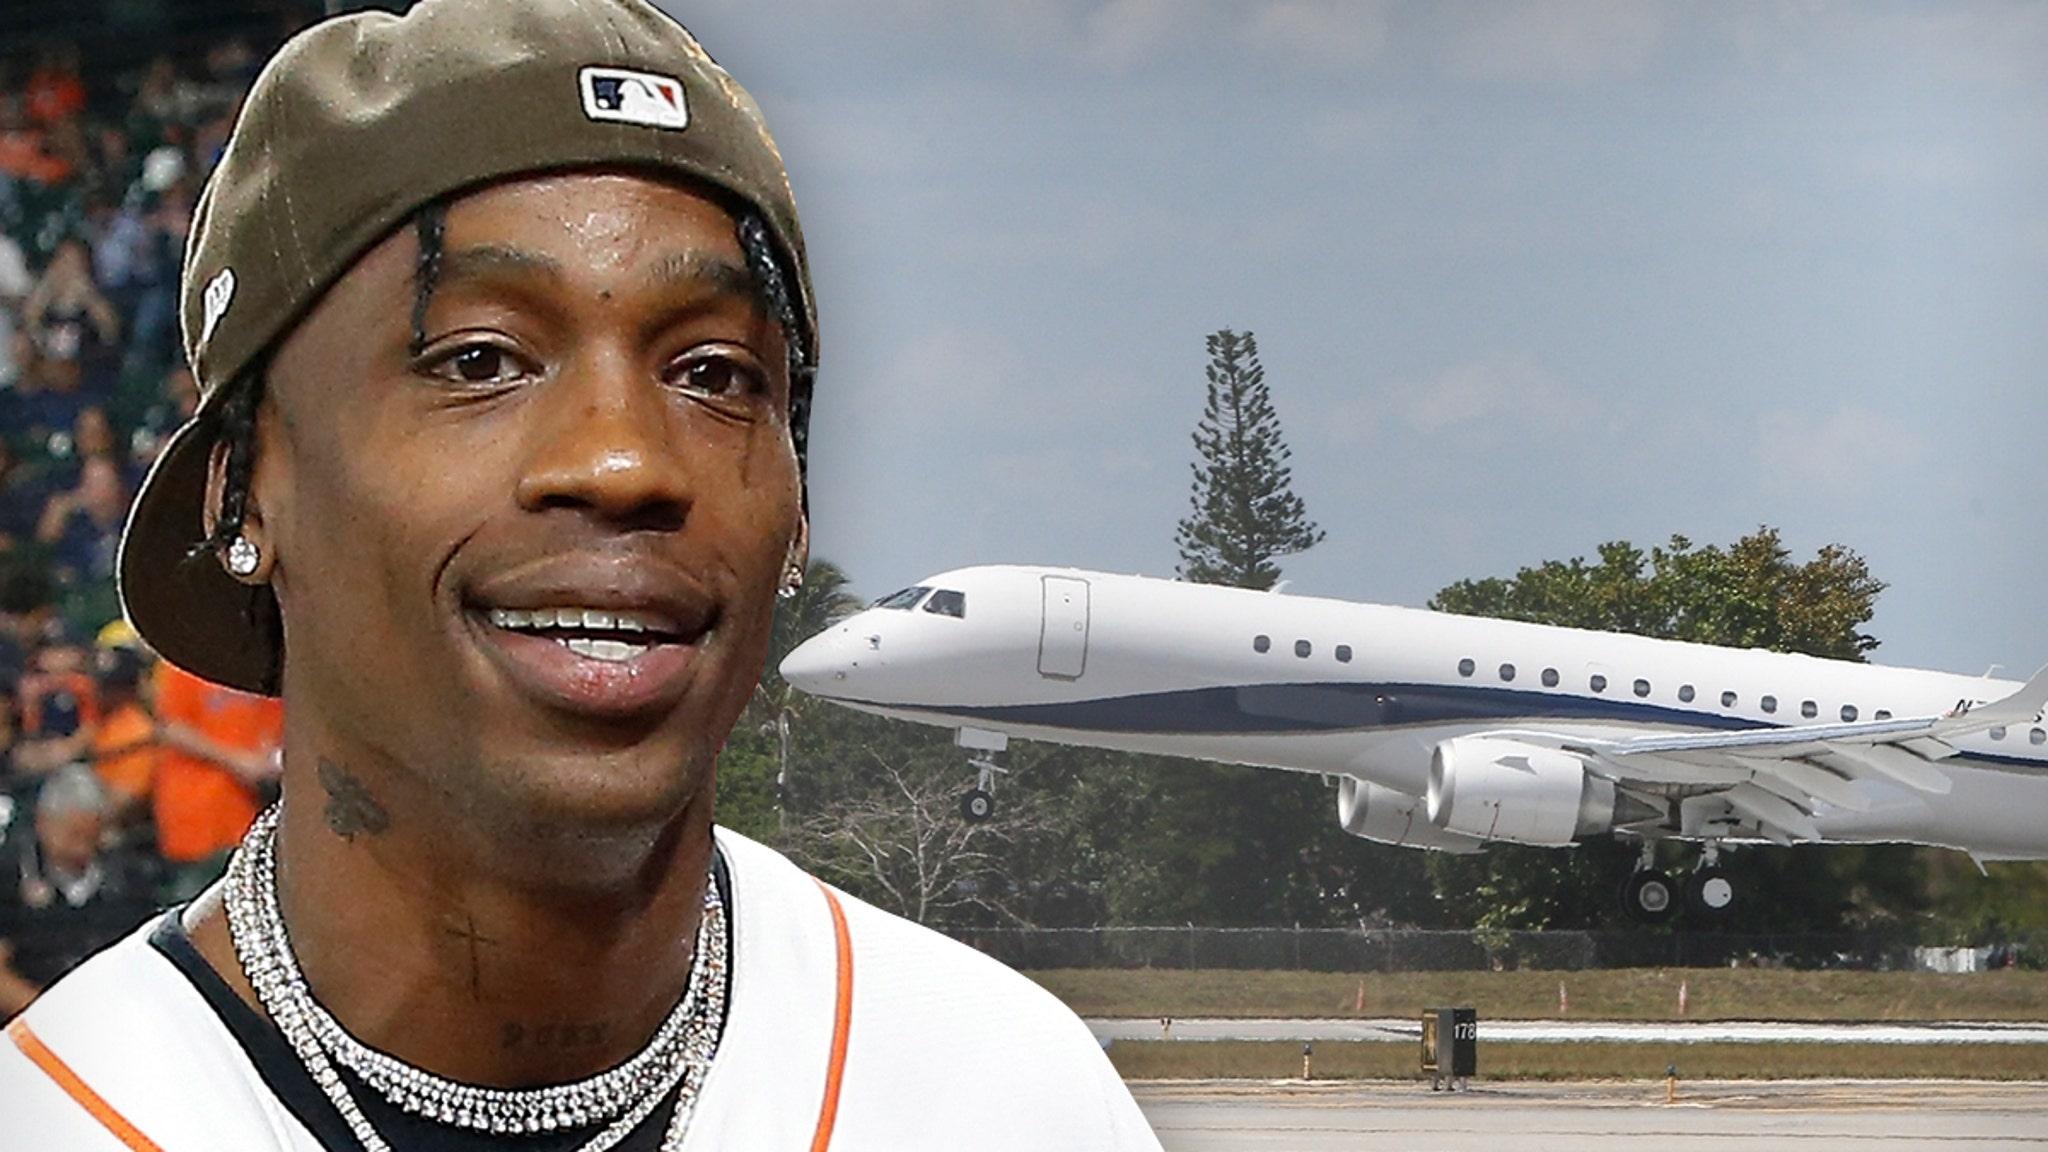 Travis Scott Celebrates 29th Birthday on Enormous Jet